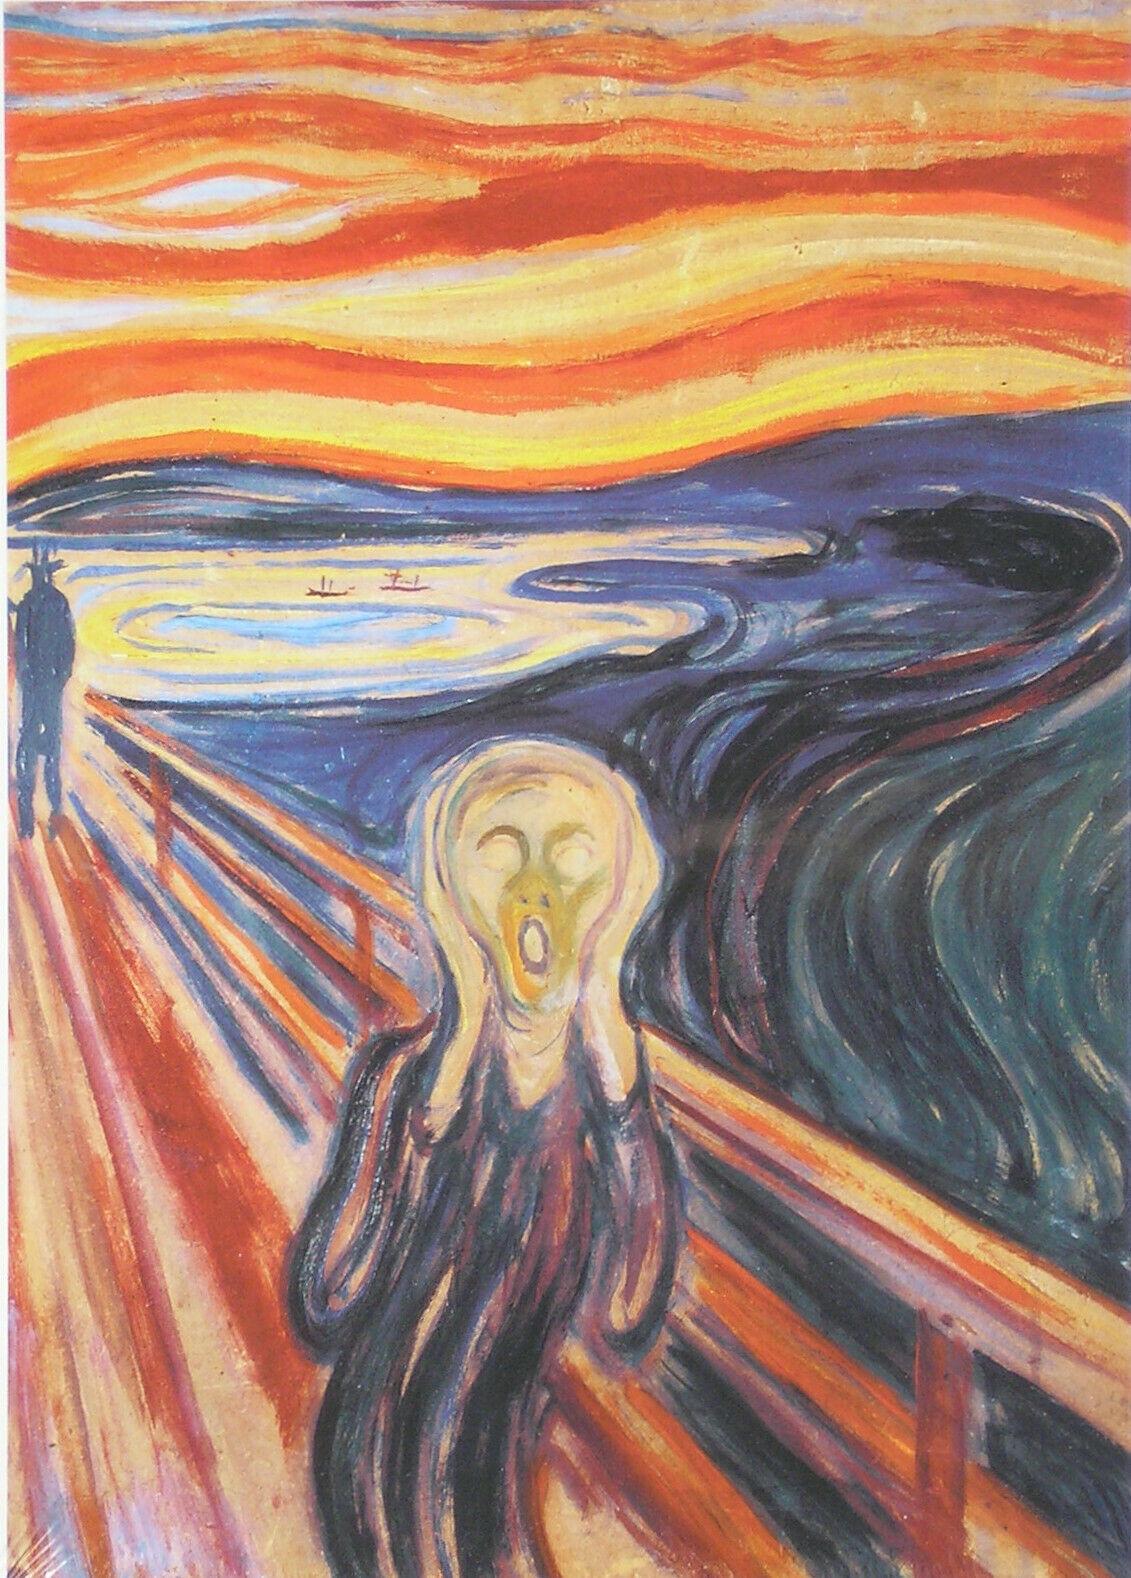 Piatnik Edvard Munch The Scream 1910 1000 pc Jigsaw Puzzle Expressionism Art - $17.81